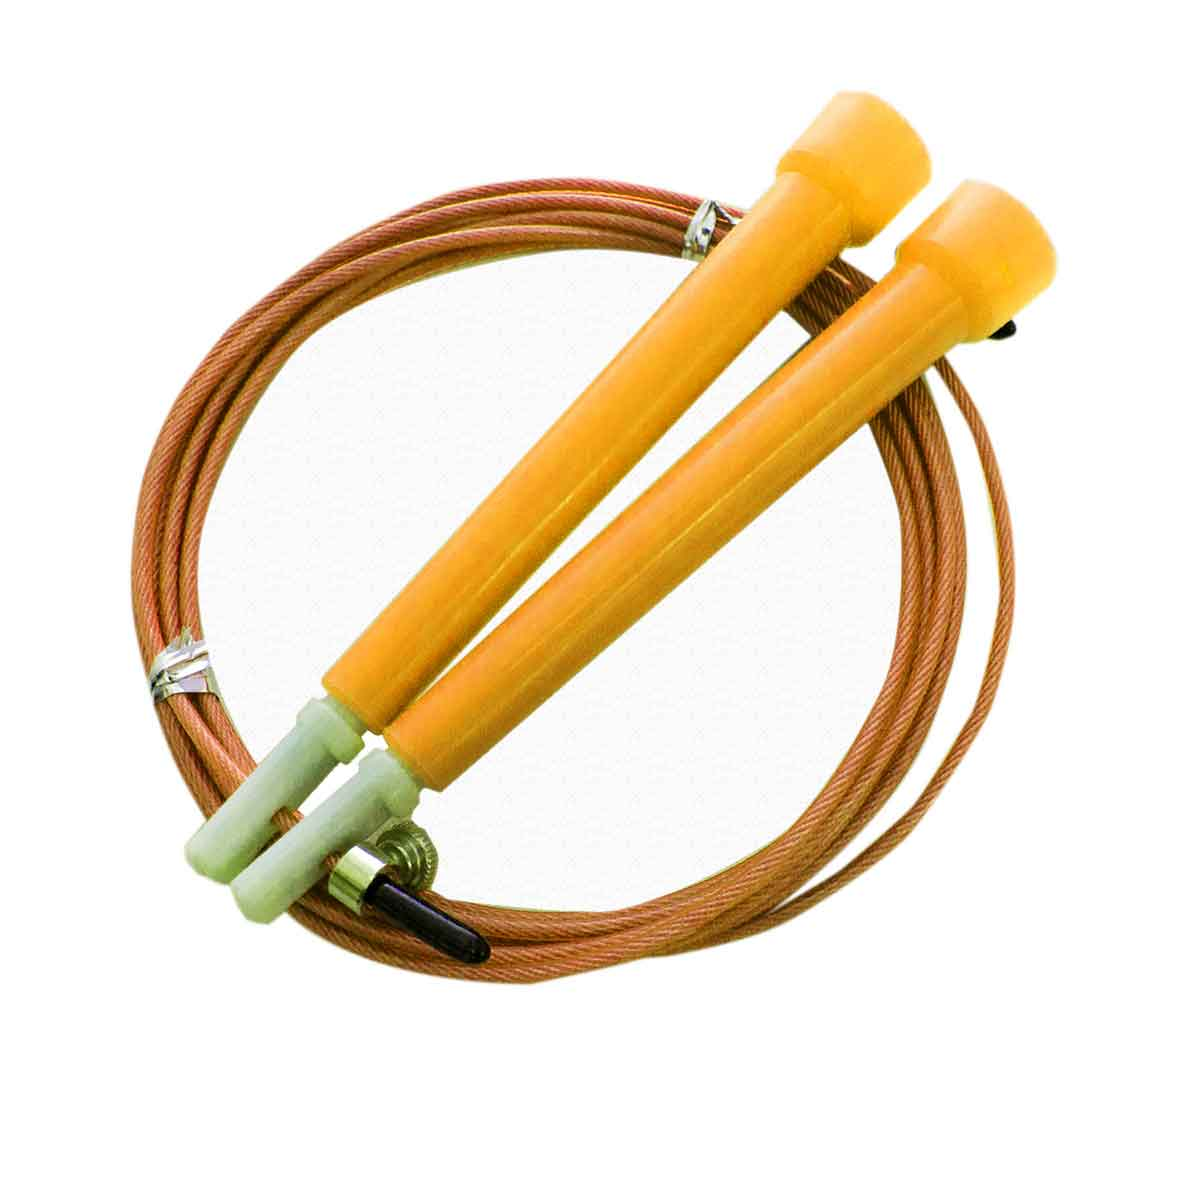 10x Corda De Pular 3m Cabo Aço Rolamento Crossfit Speed Rope